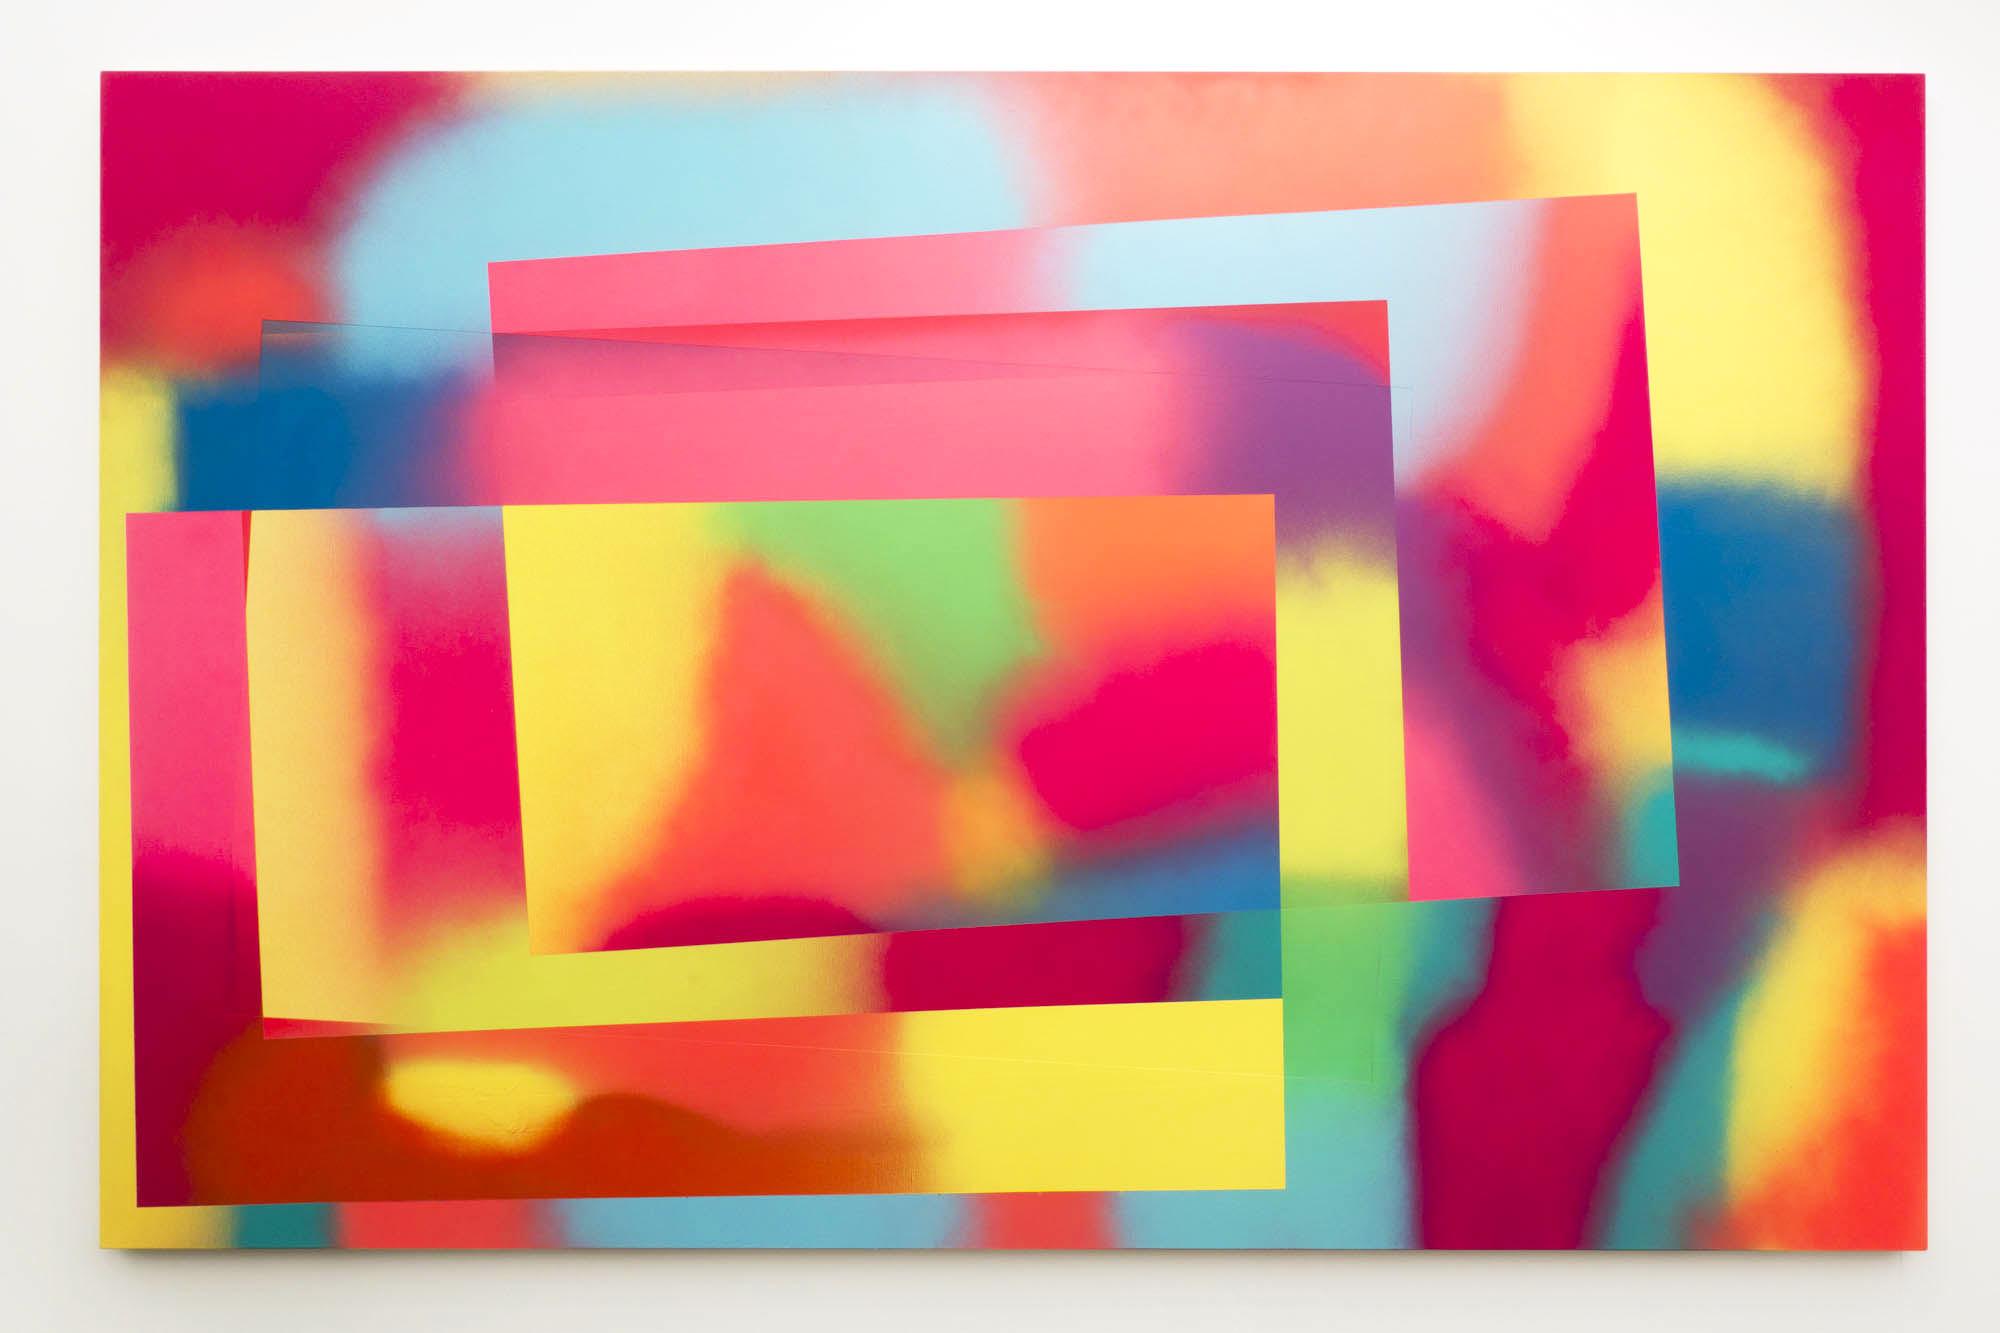 Eddie Peake, Gallerie Lorcan O'Neill, installation view, Frieze London 2017